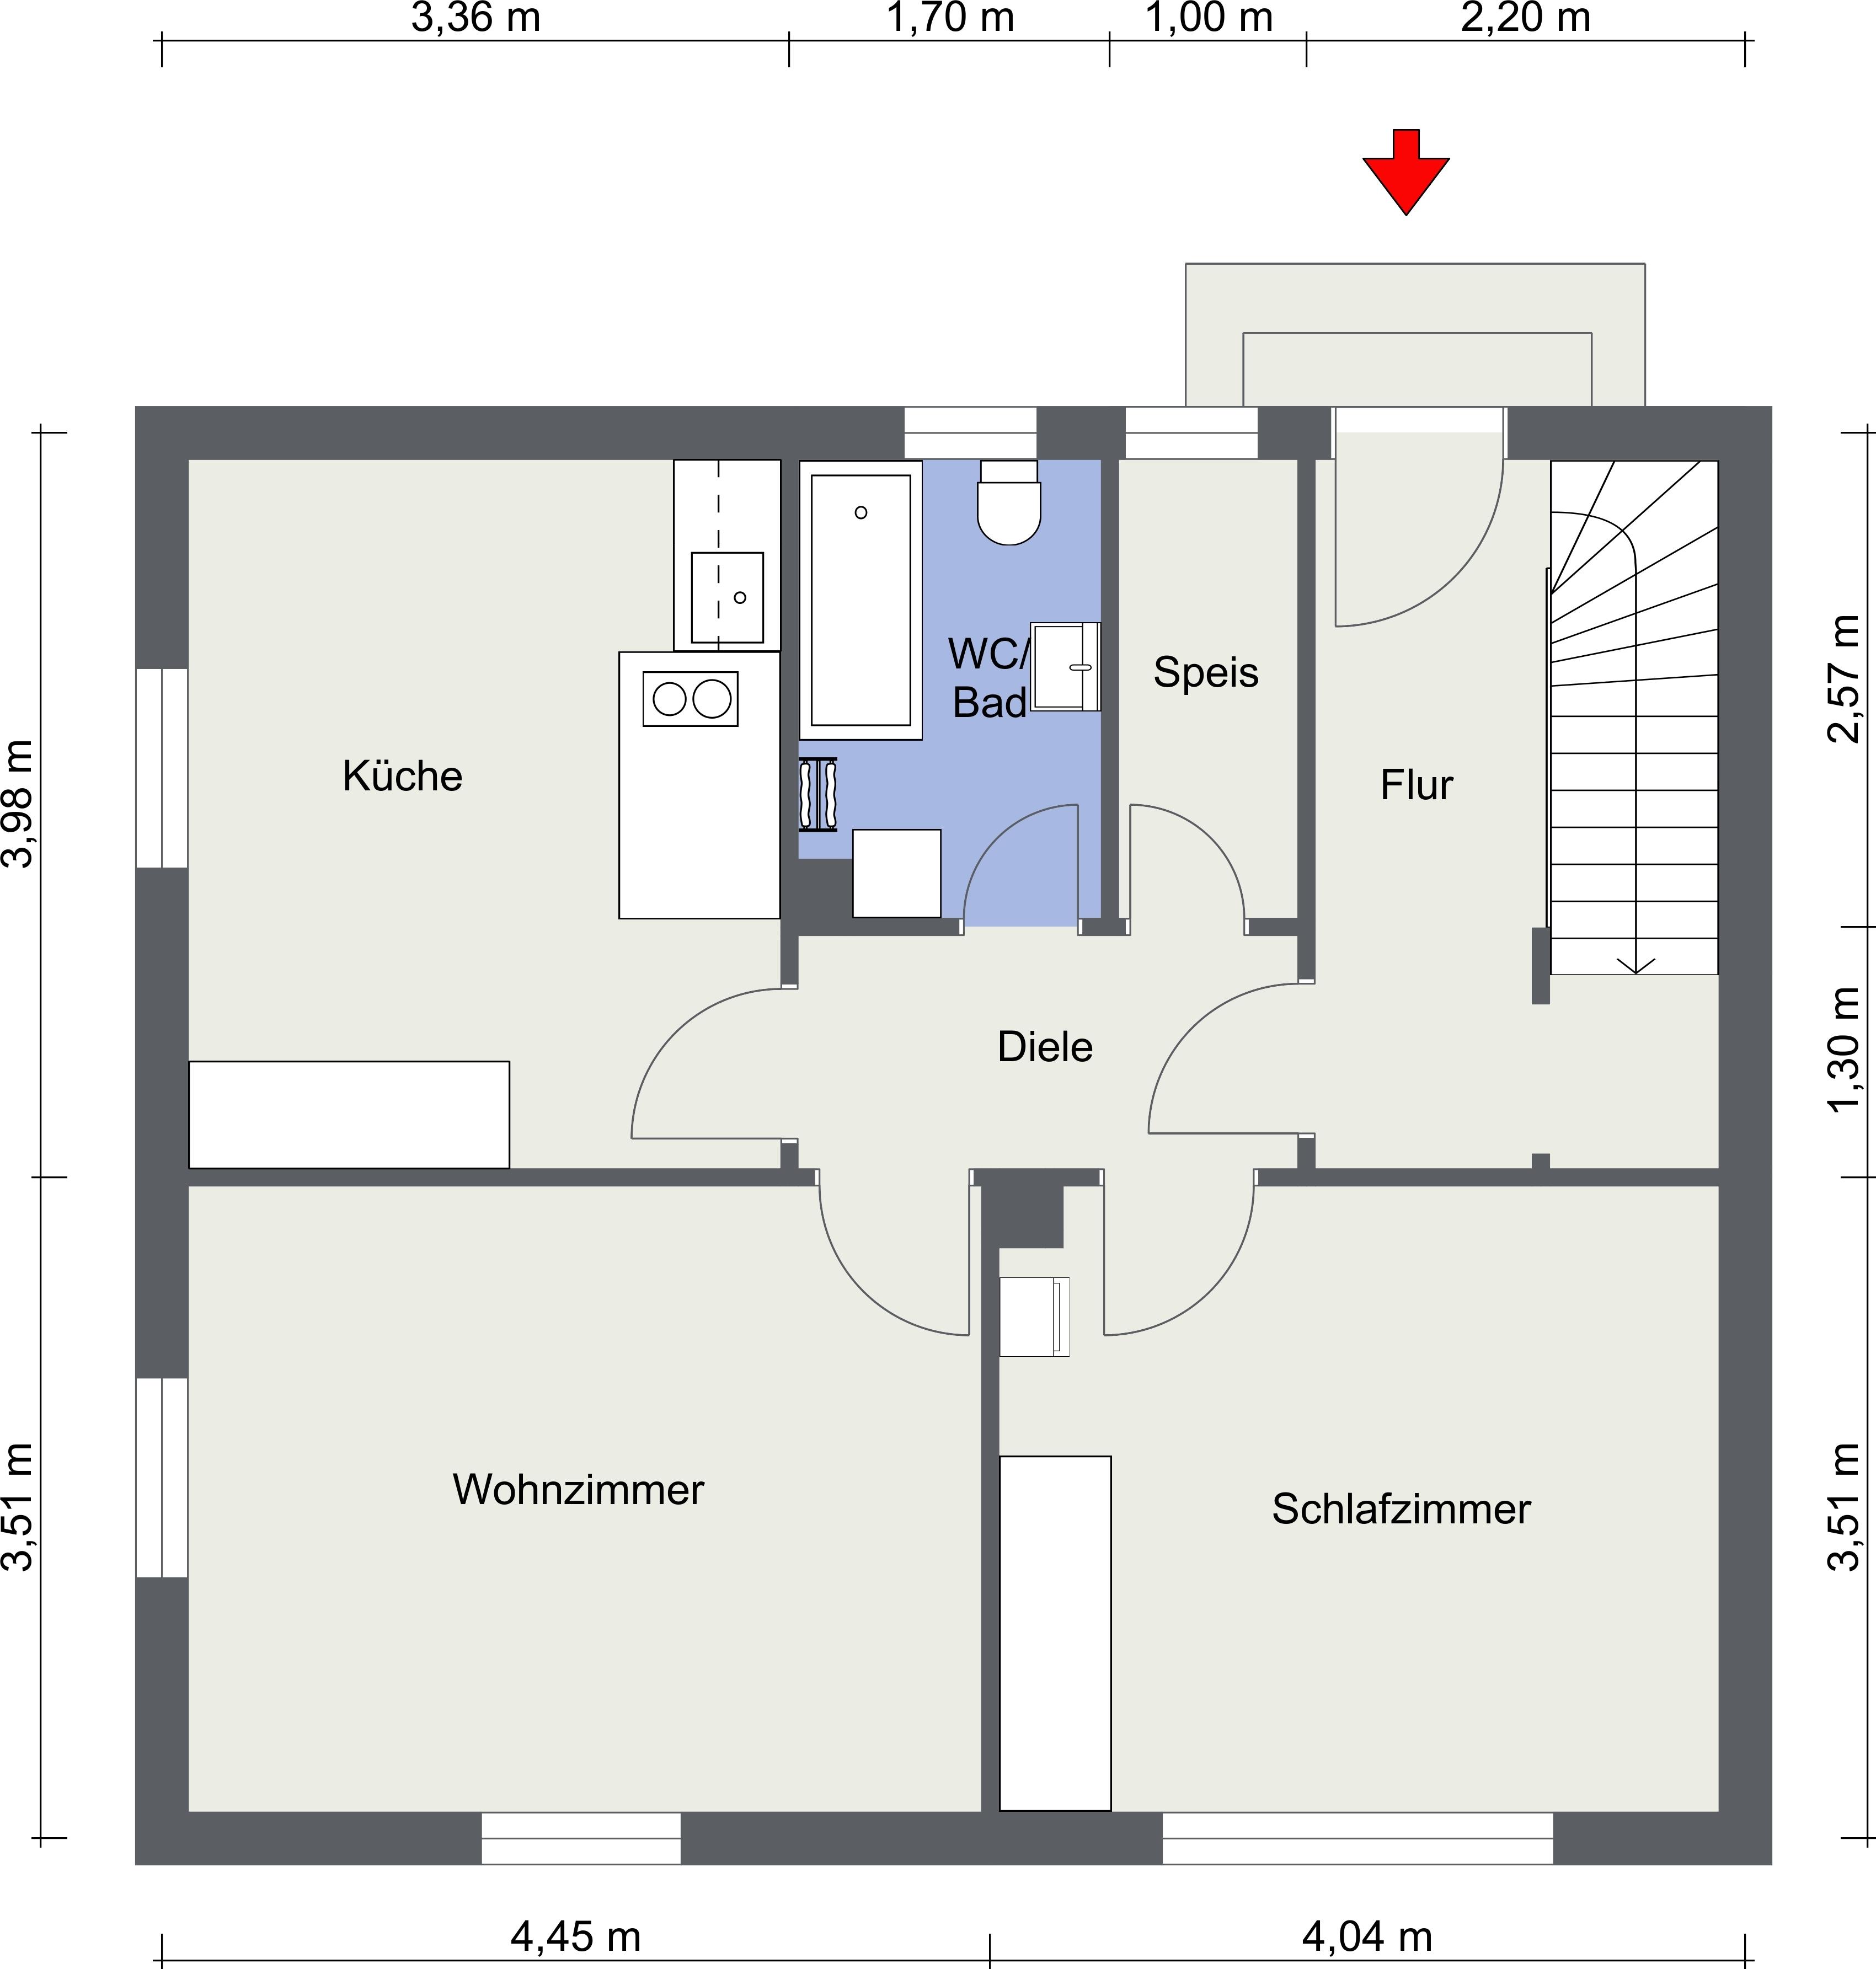 Erdgeschoss - 2D Floor Plan